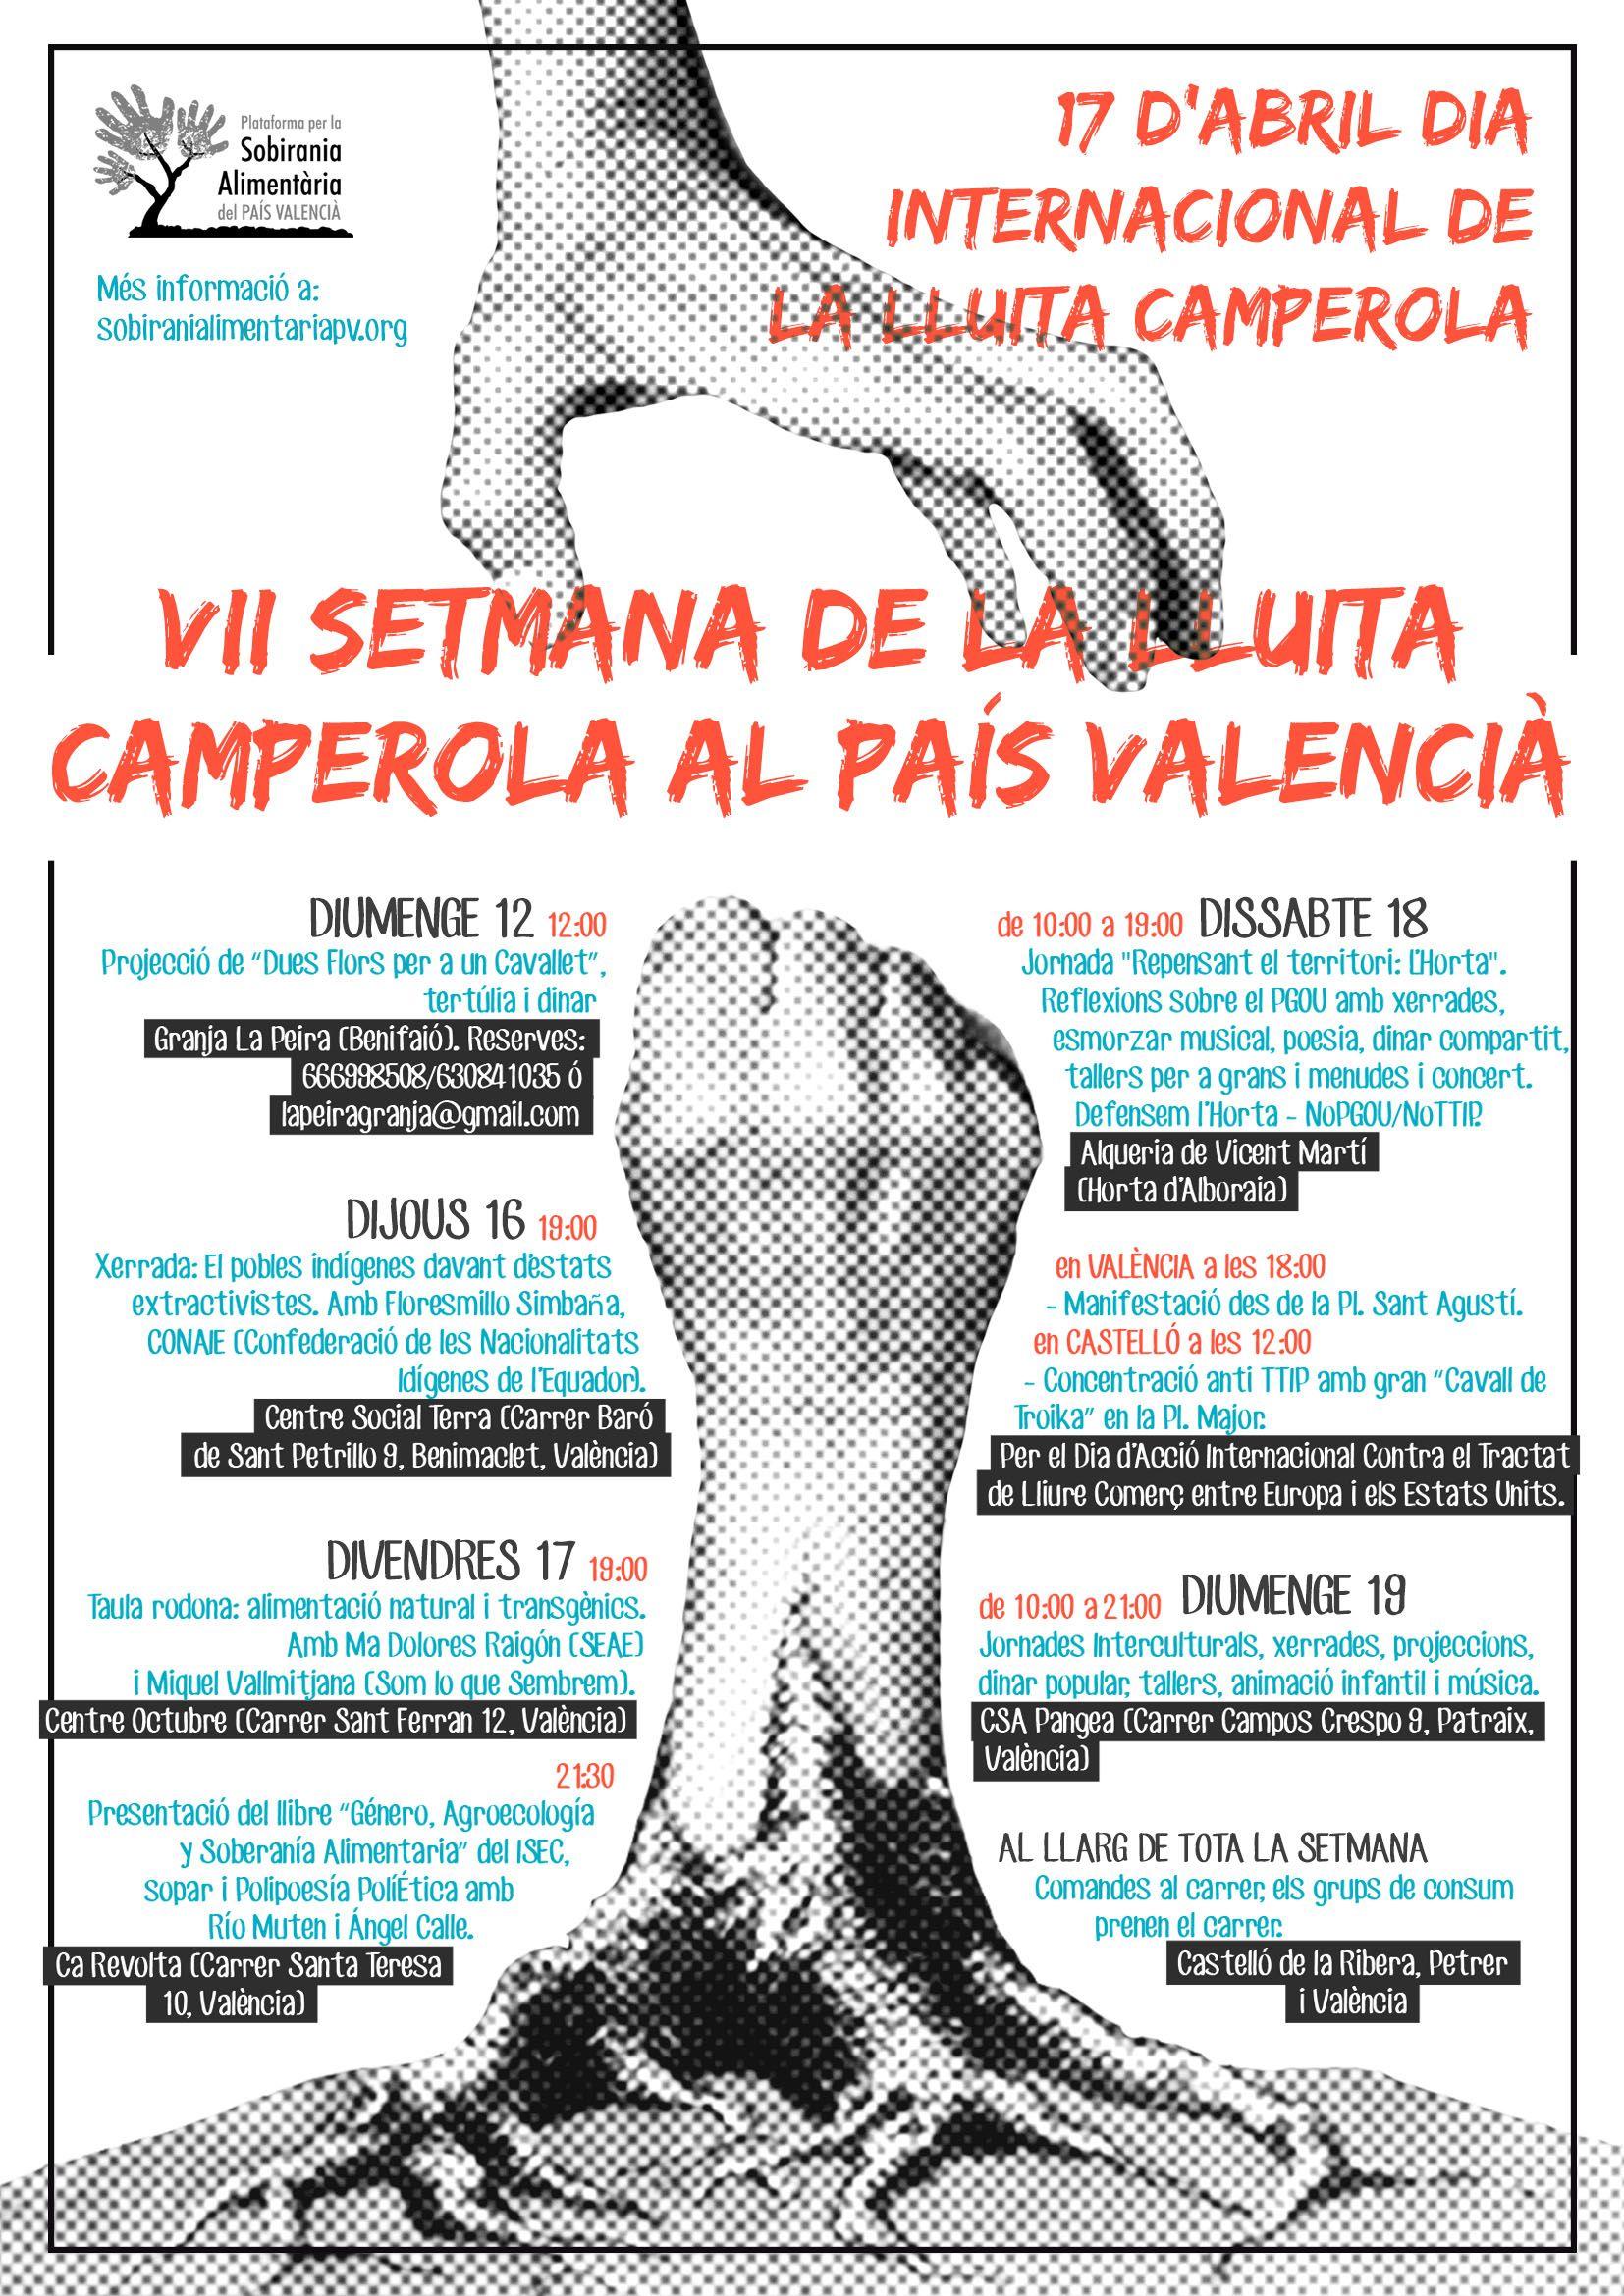 VII Setmana de Lluita Camperola. 17 de Abril, día internacional de la lucha campesina.